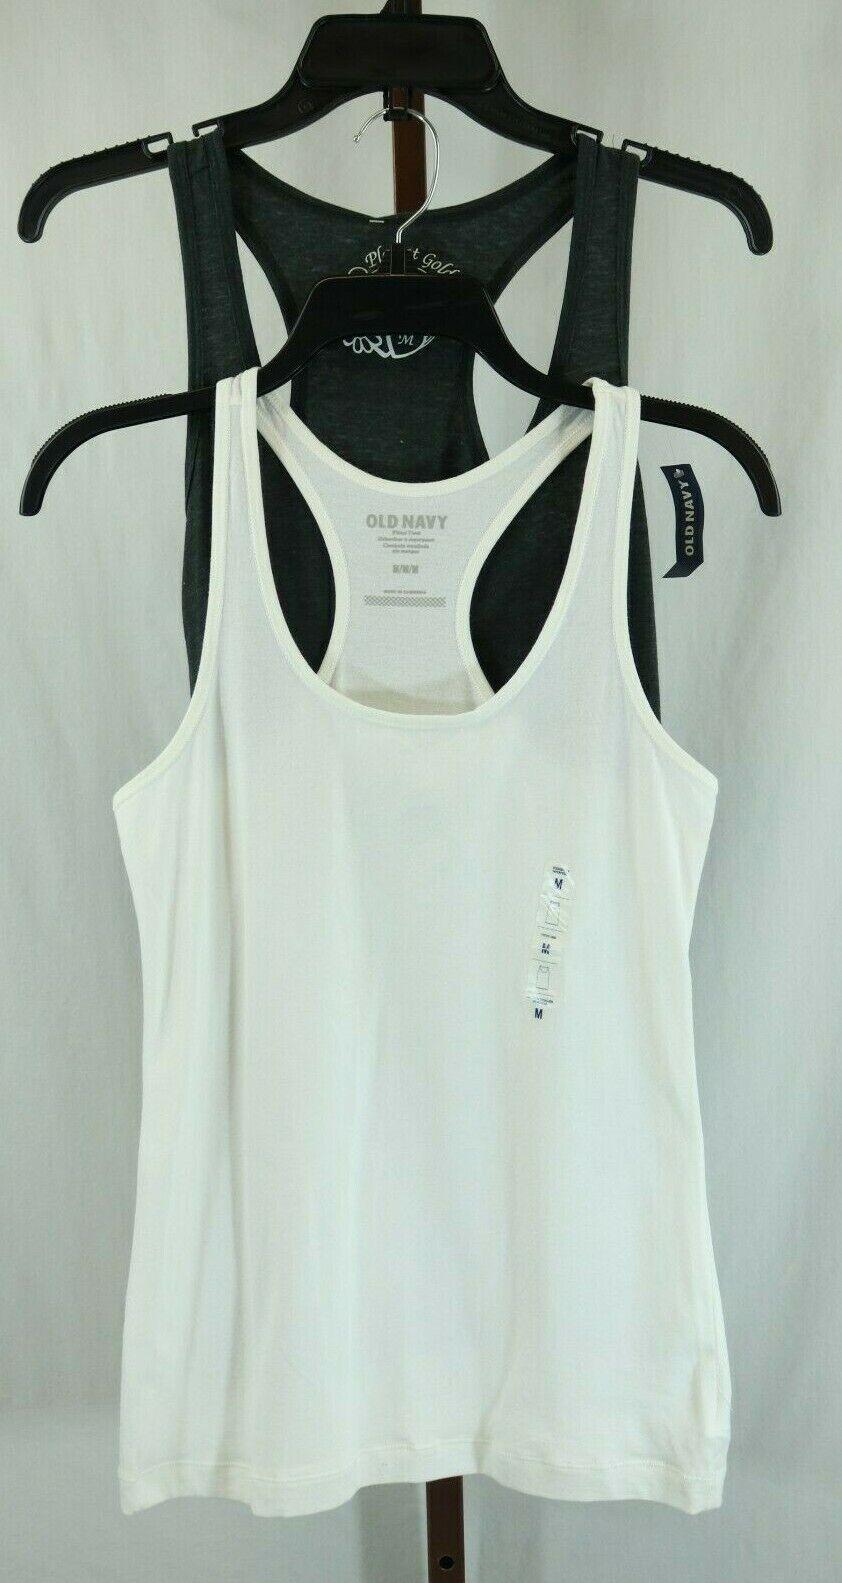 Multi Brand Womens Ladies Gray White Racerback Sleeveless Tank T-Shirts M NEW